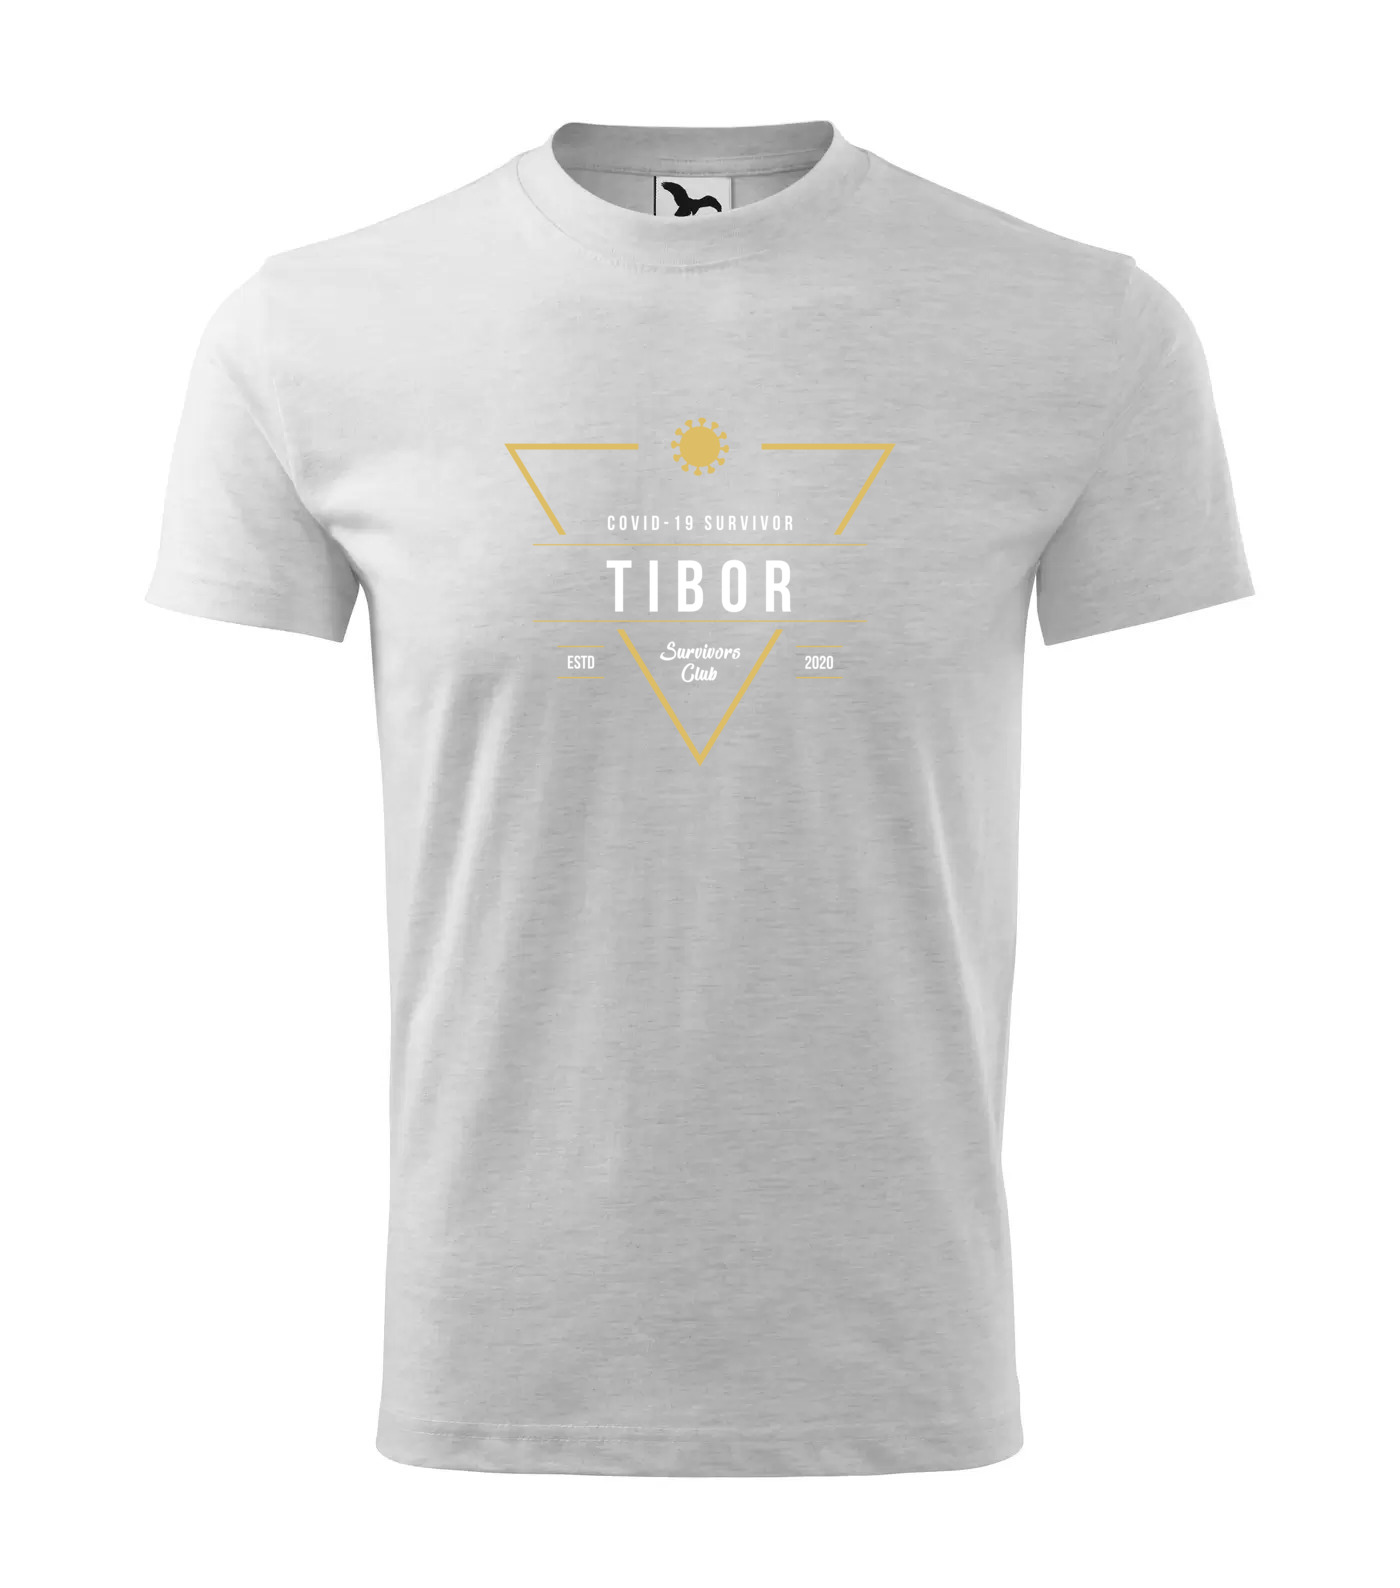 Tričko Survivor Club Tibor